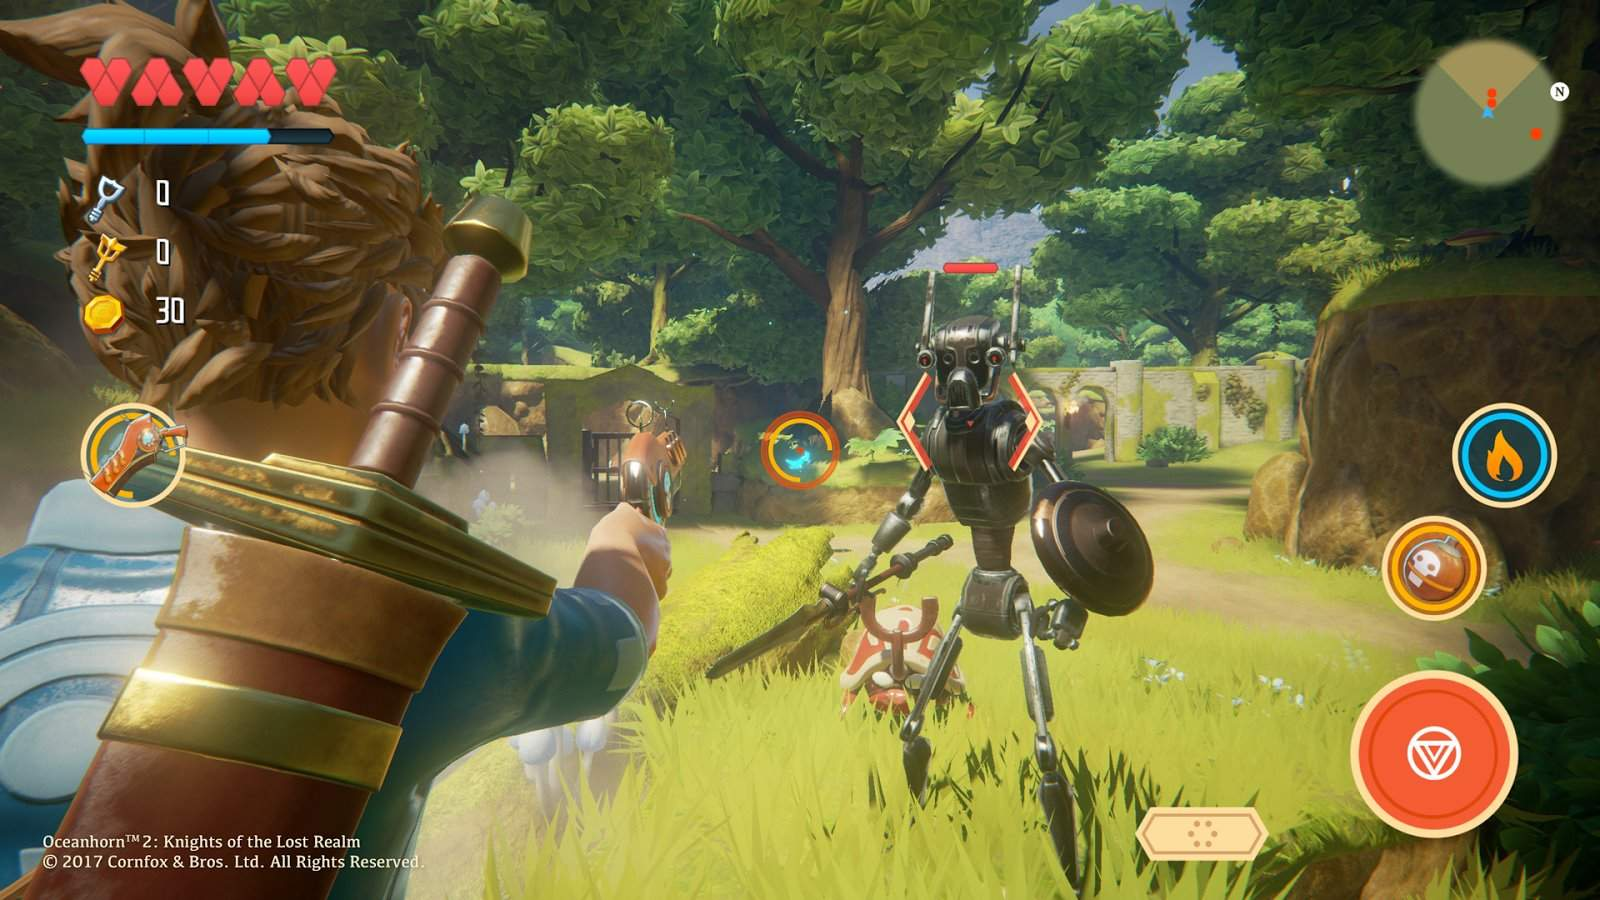 Oceanhorn-2-Mobile-screenshot-Warden-Woods Oceanhorn 2: novas imagens mostram jogo com Unreal Engine 4